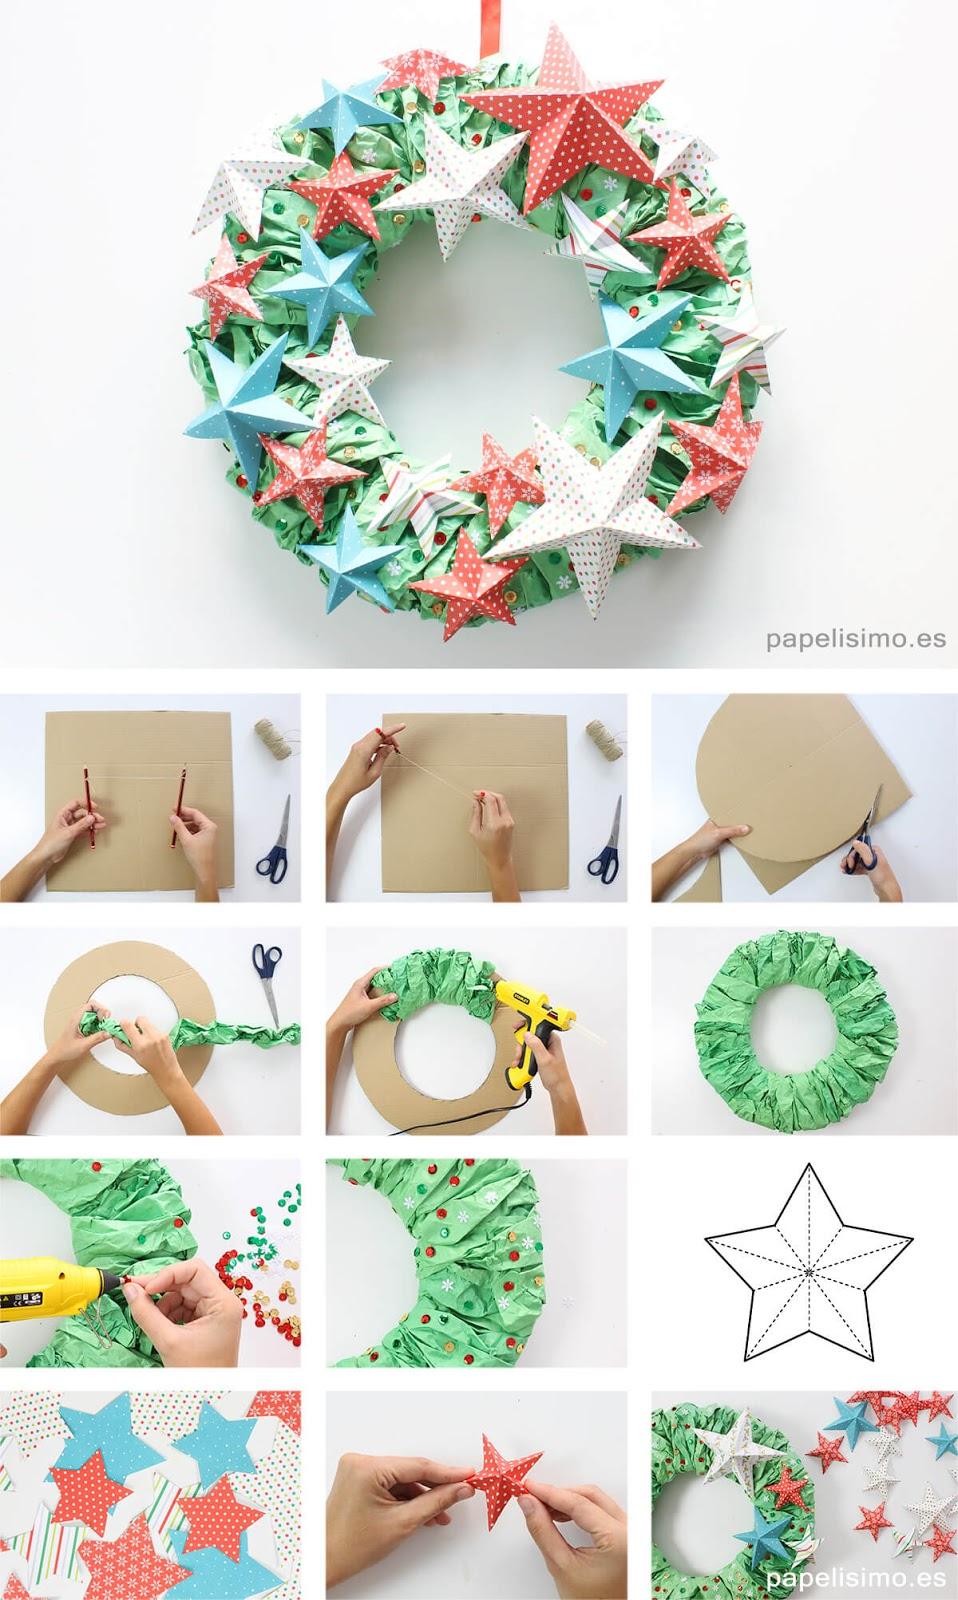 Guirlanda de Natal feita com papel de scrapbooking